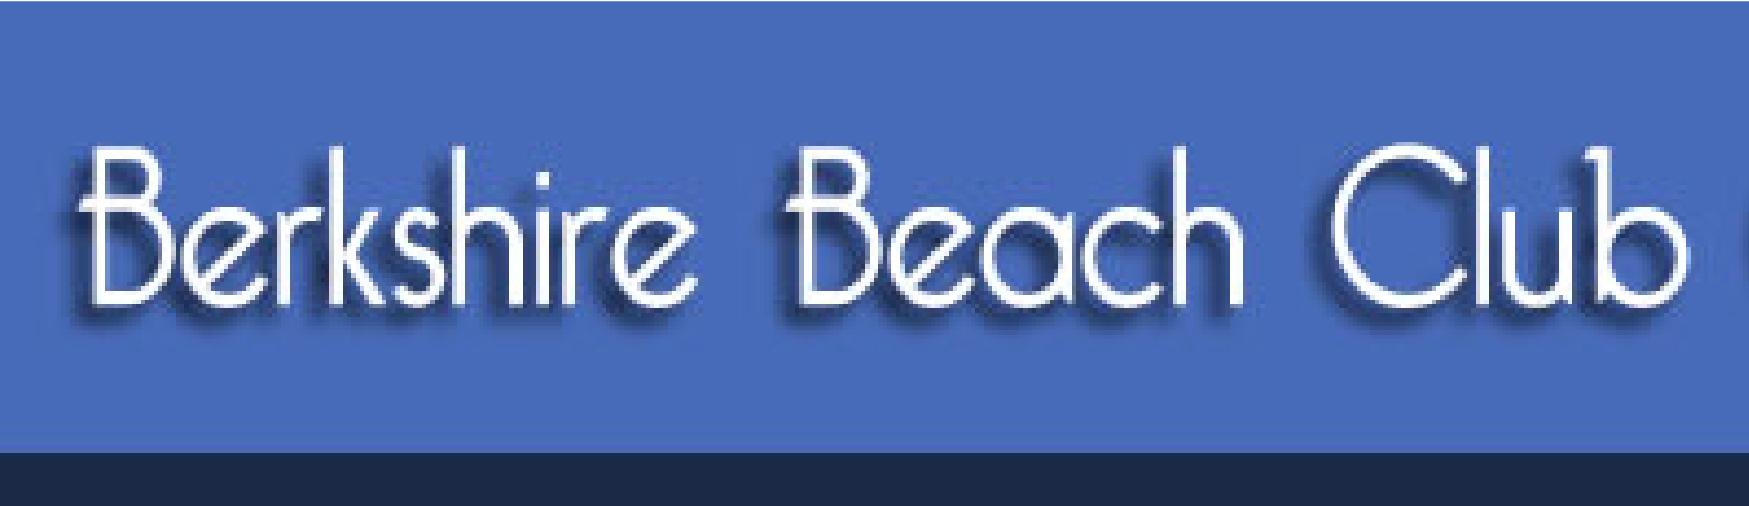 Berkshire Beach Club